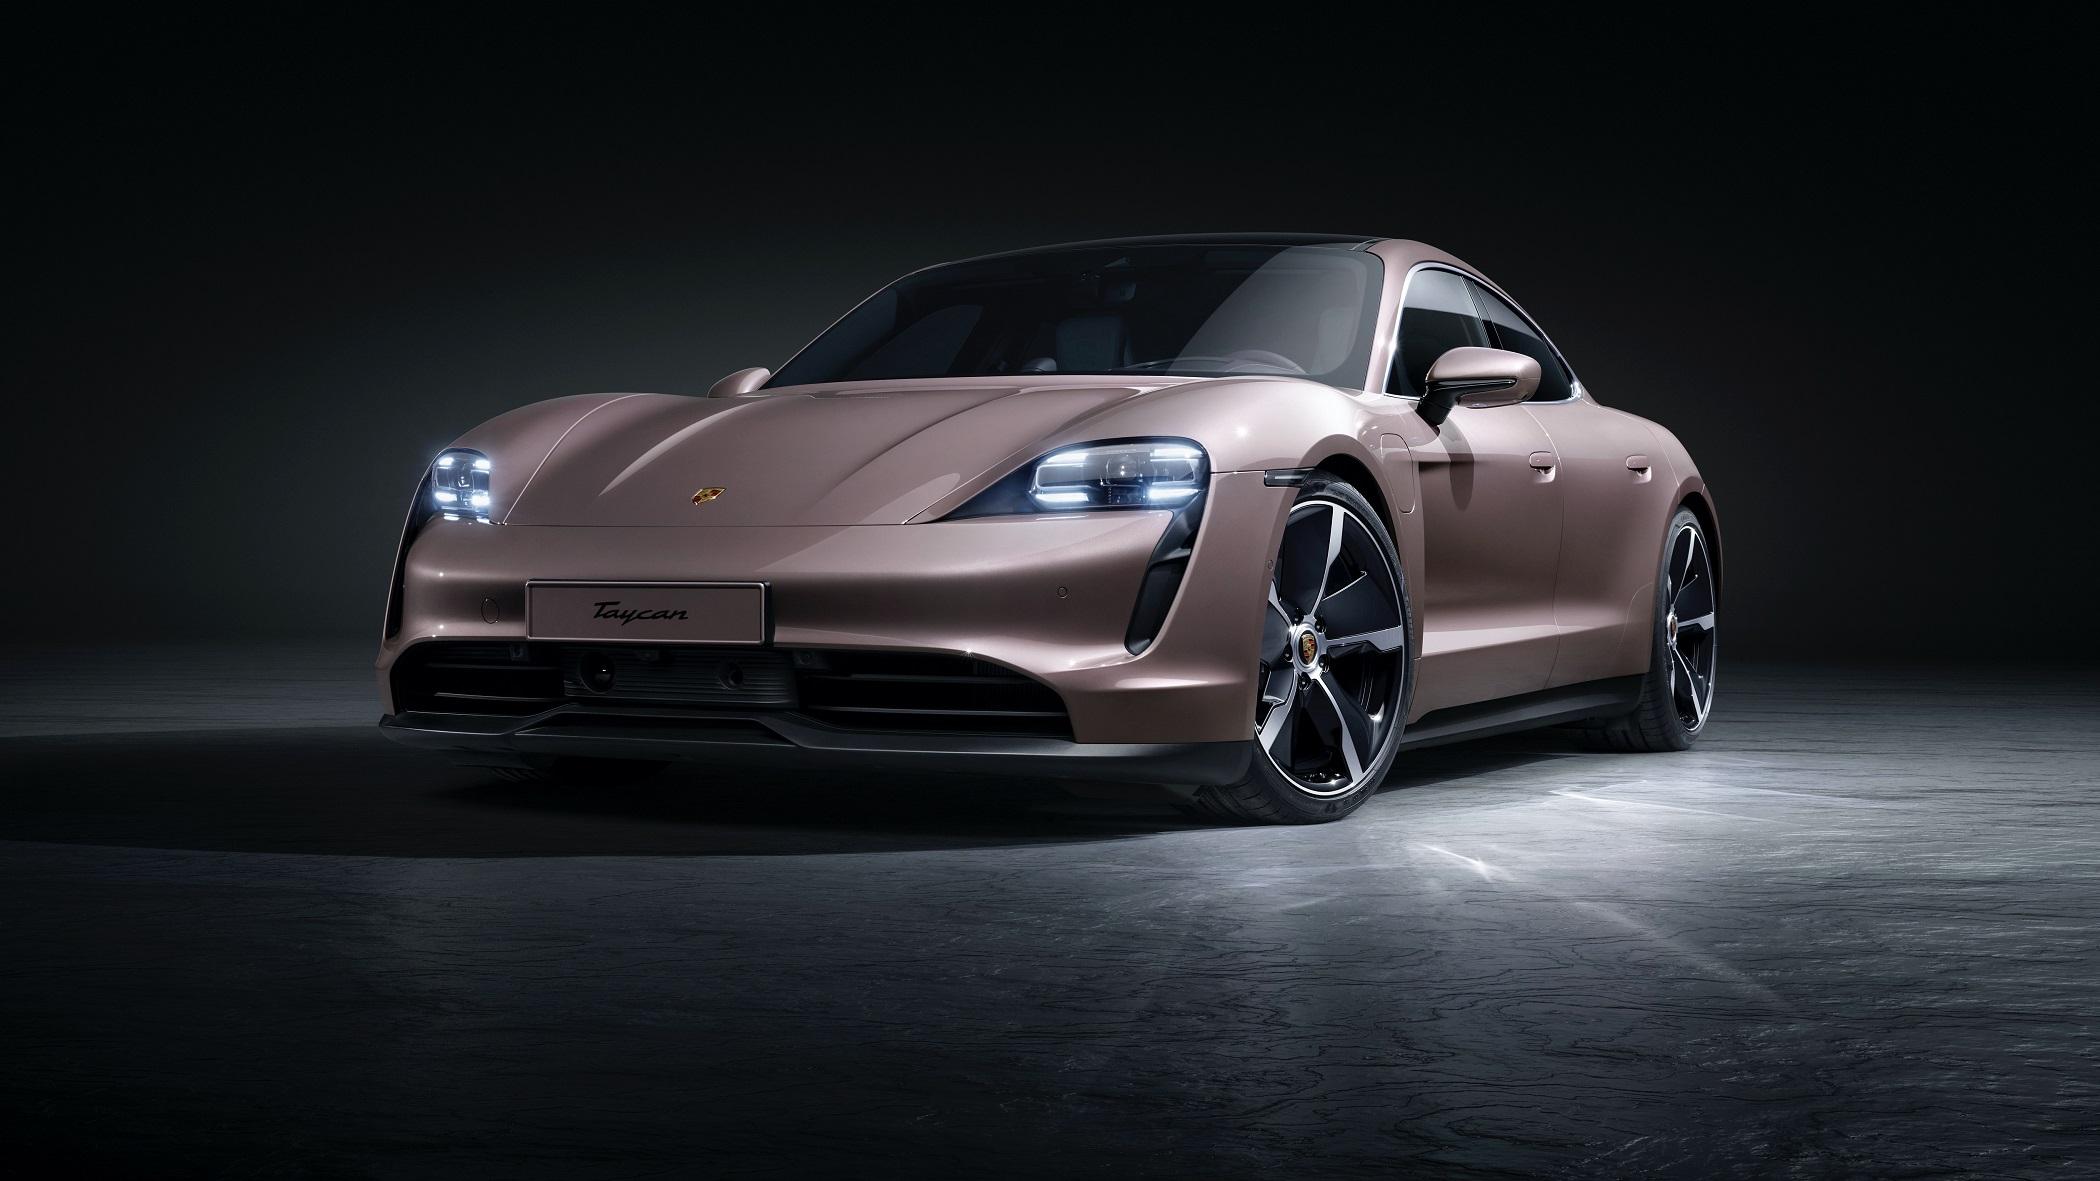 Porsche представила четвёртую версию электрического Taycan: задний привод, две комплектации и запас хода до 484 км